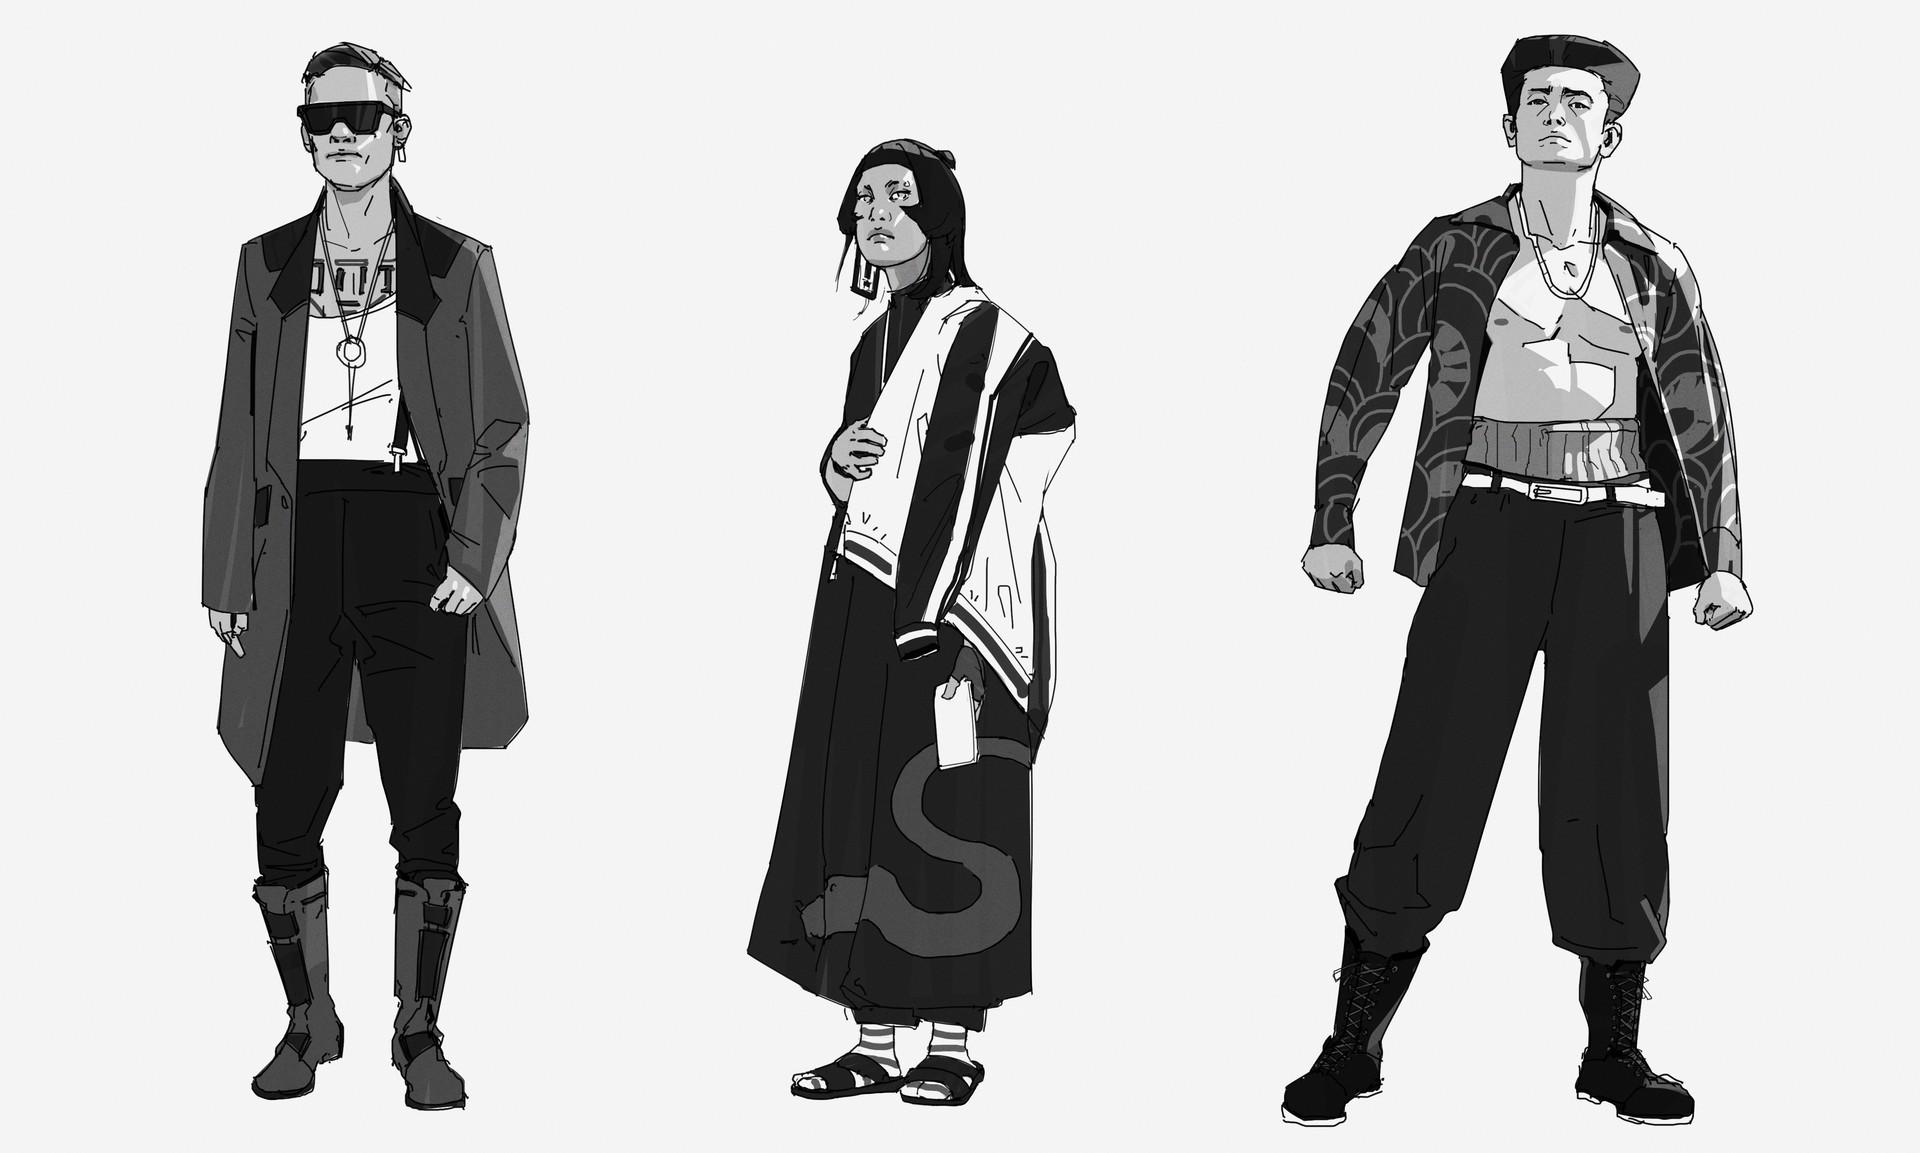 Jx saber characters 1